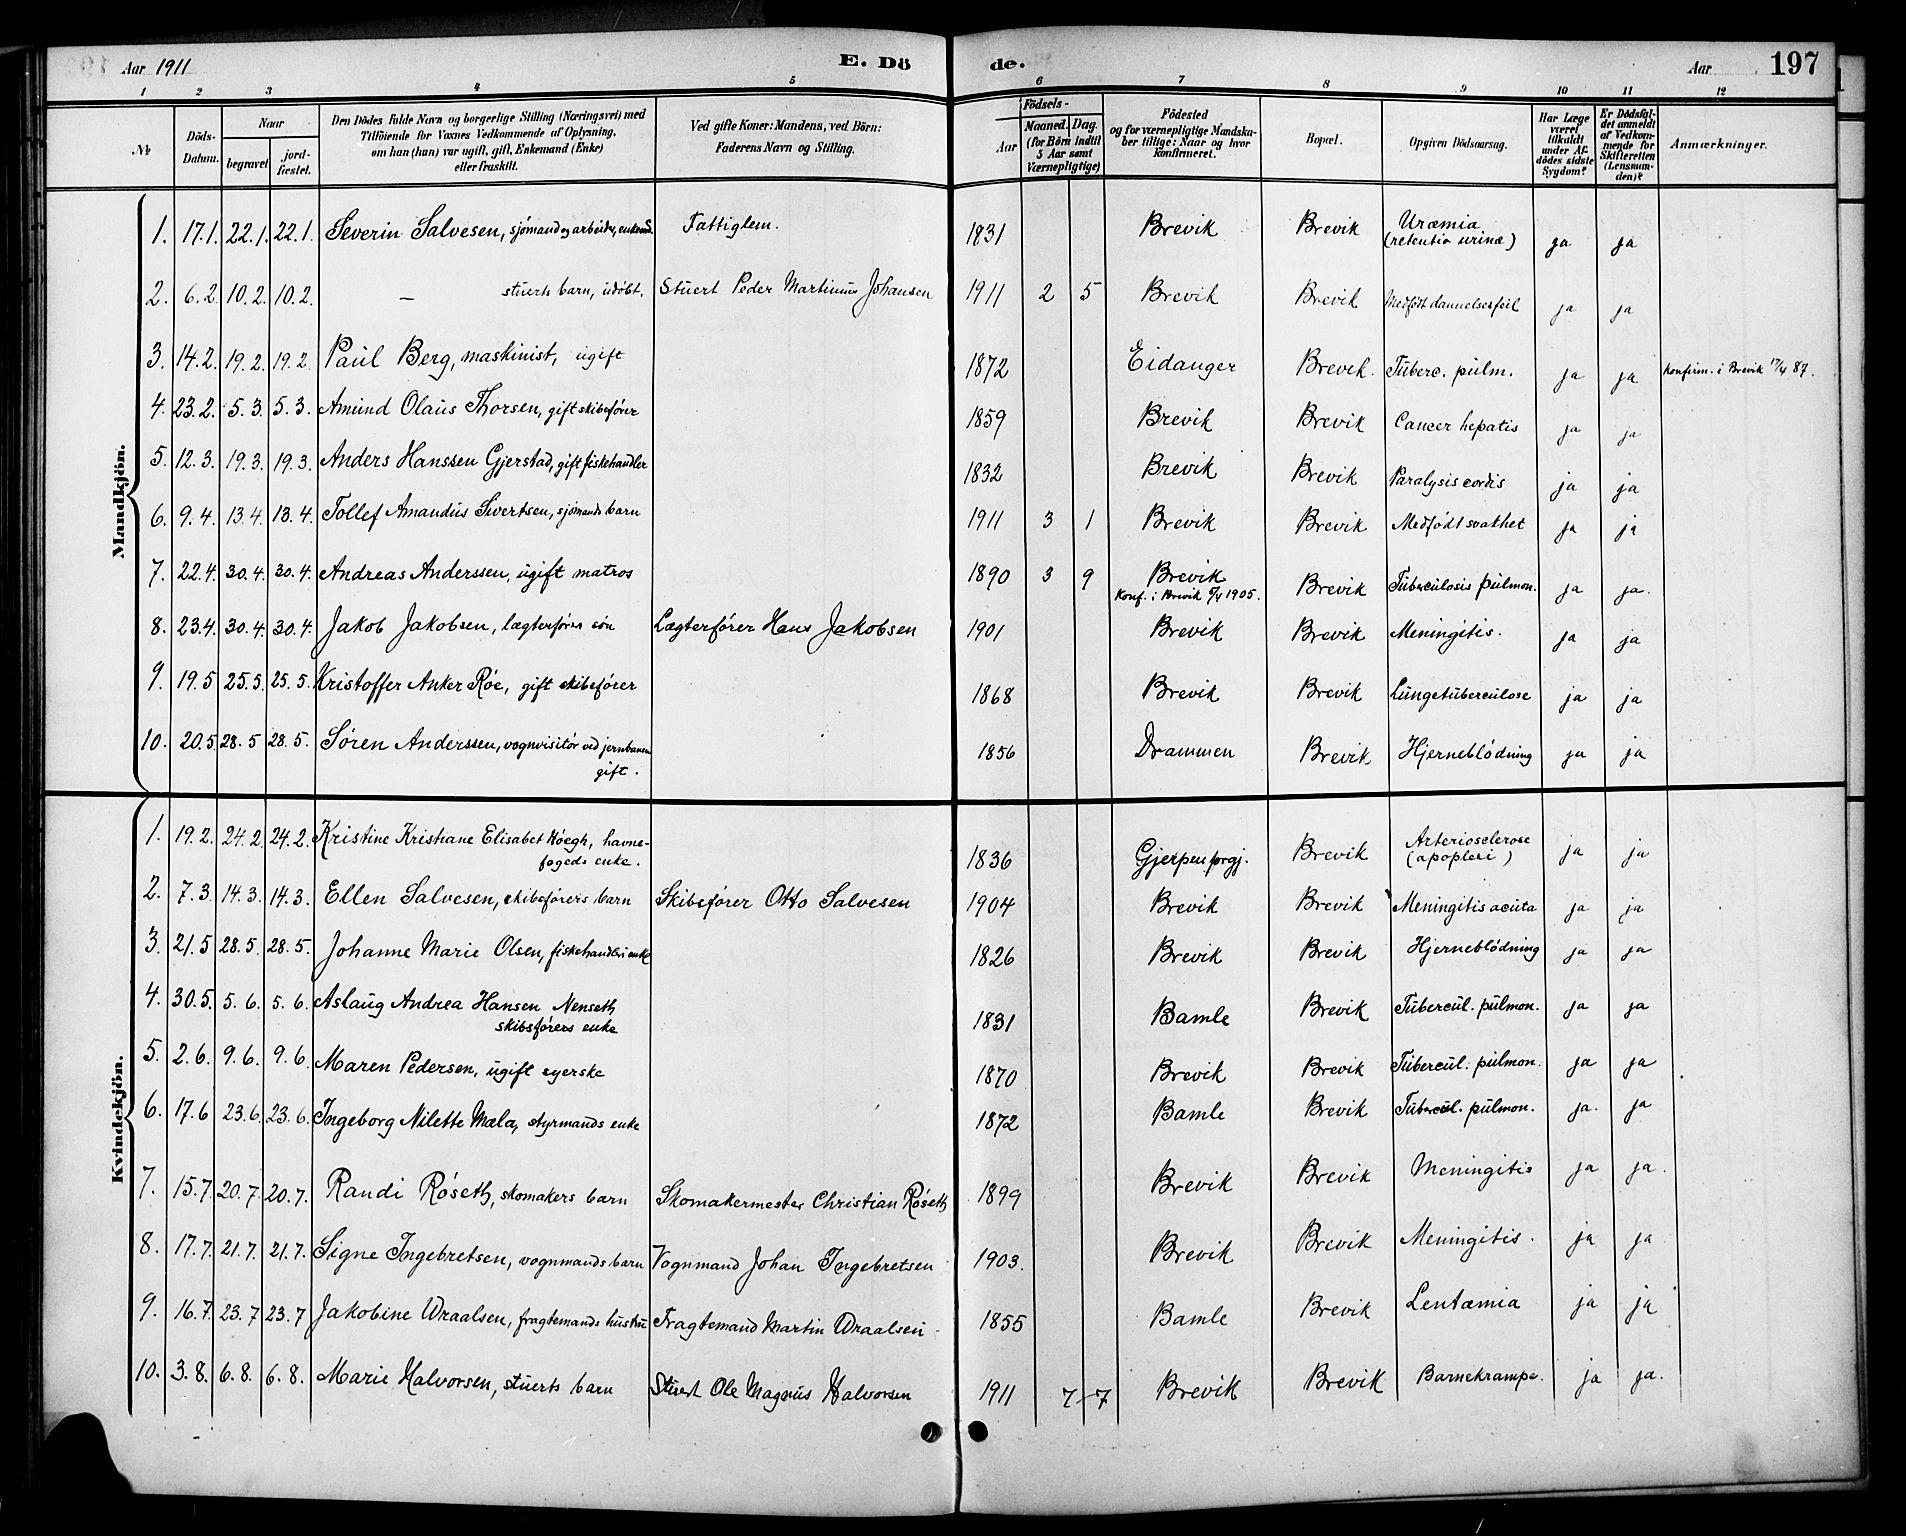 SAKO, Brevik kirkebøker, G/Ga/L0005: Klokkerbok nr. 5, 1901-1924, s. 197